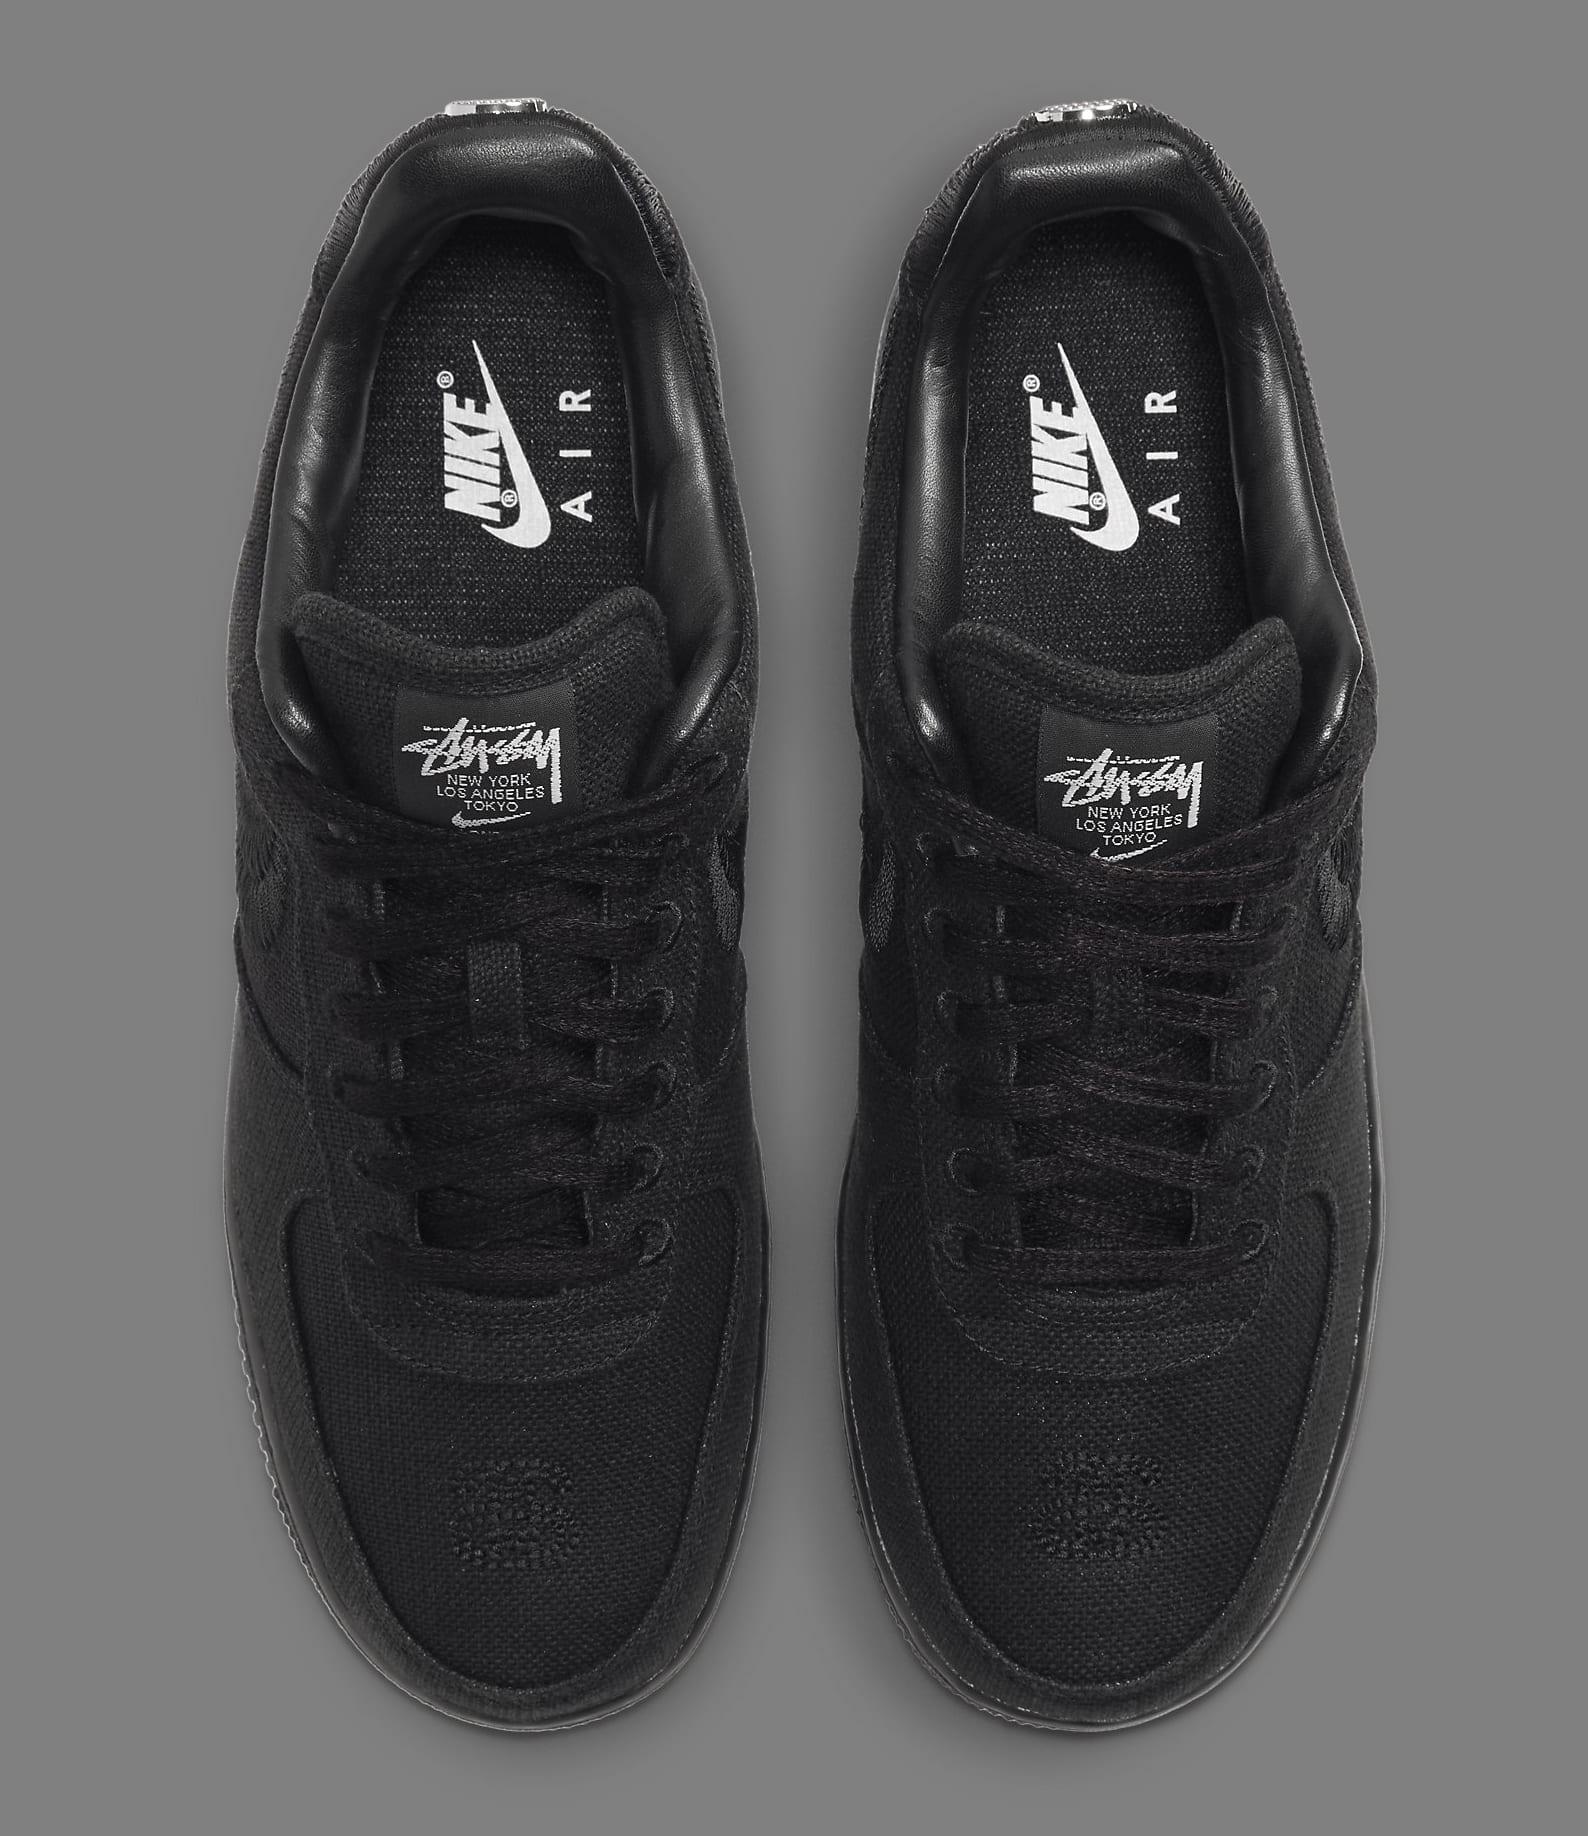 Stussy x Nike Air Force 1 Low 'Black' CZ9084-001 Top